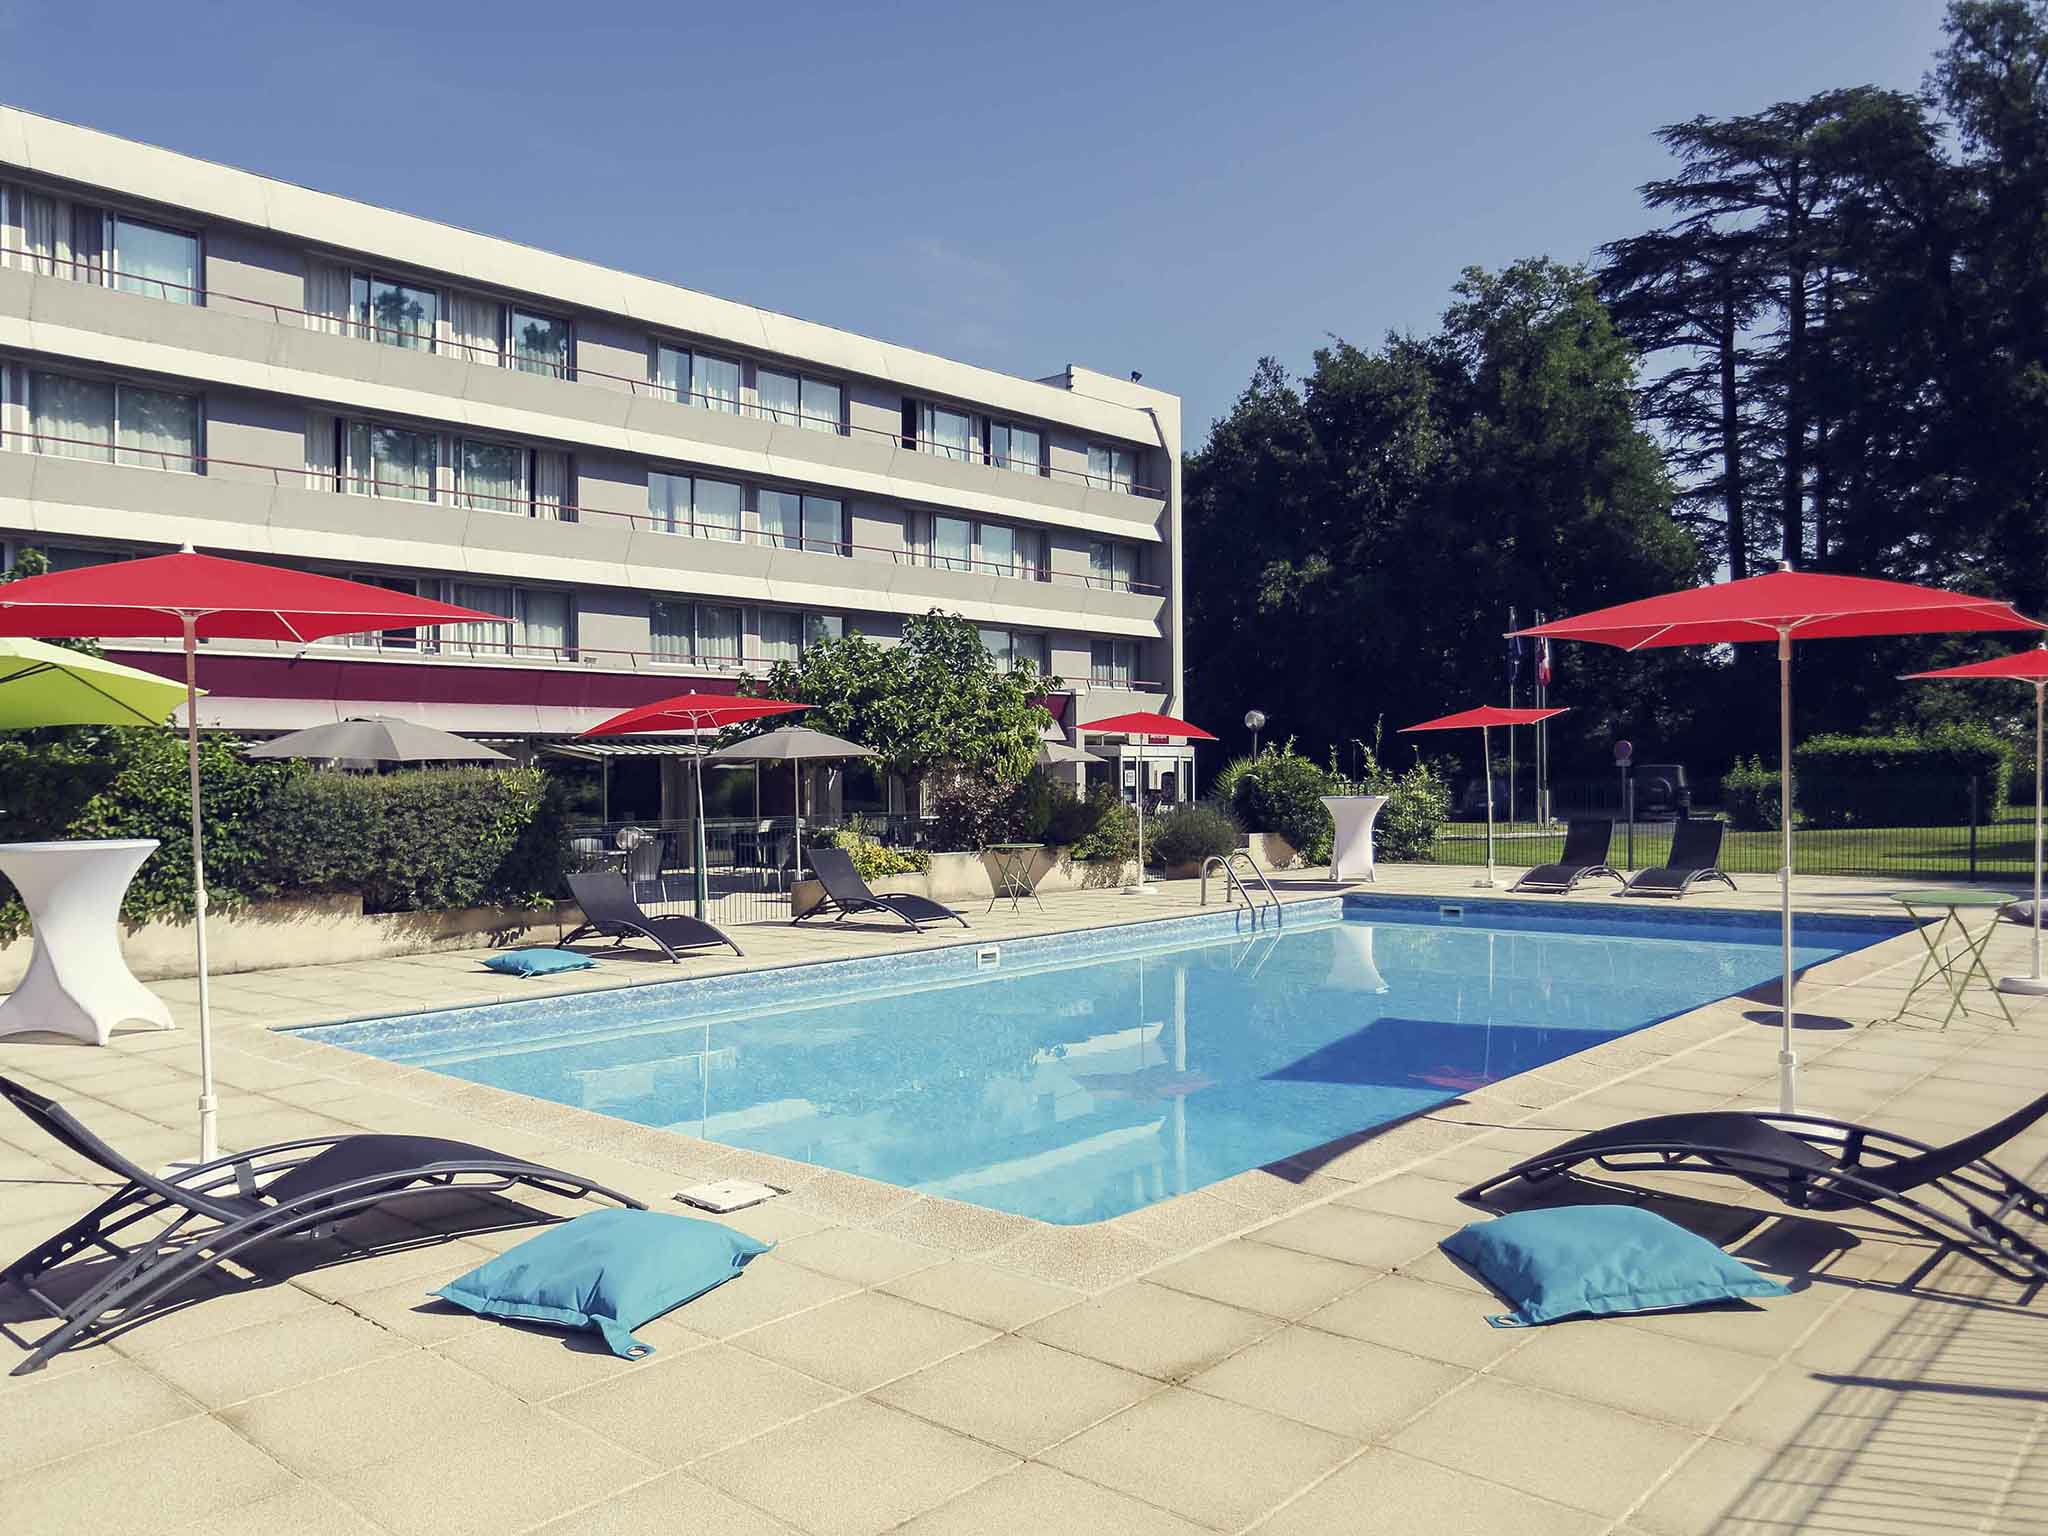 Otel – Hôtel Mercure Brive